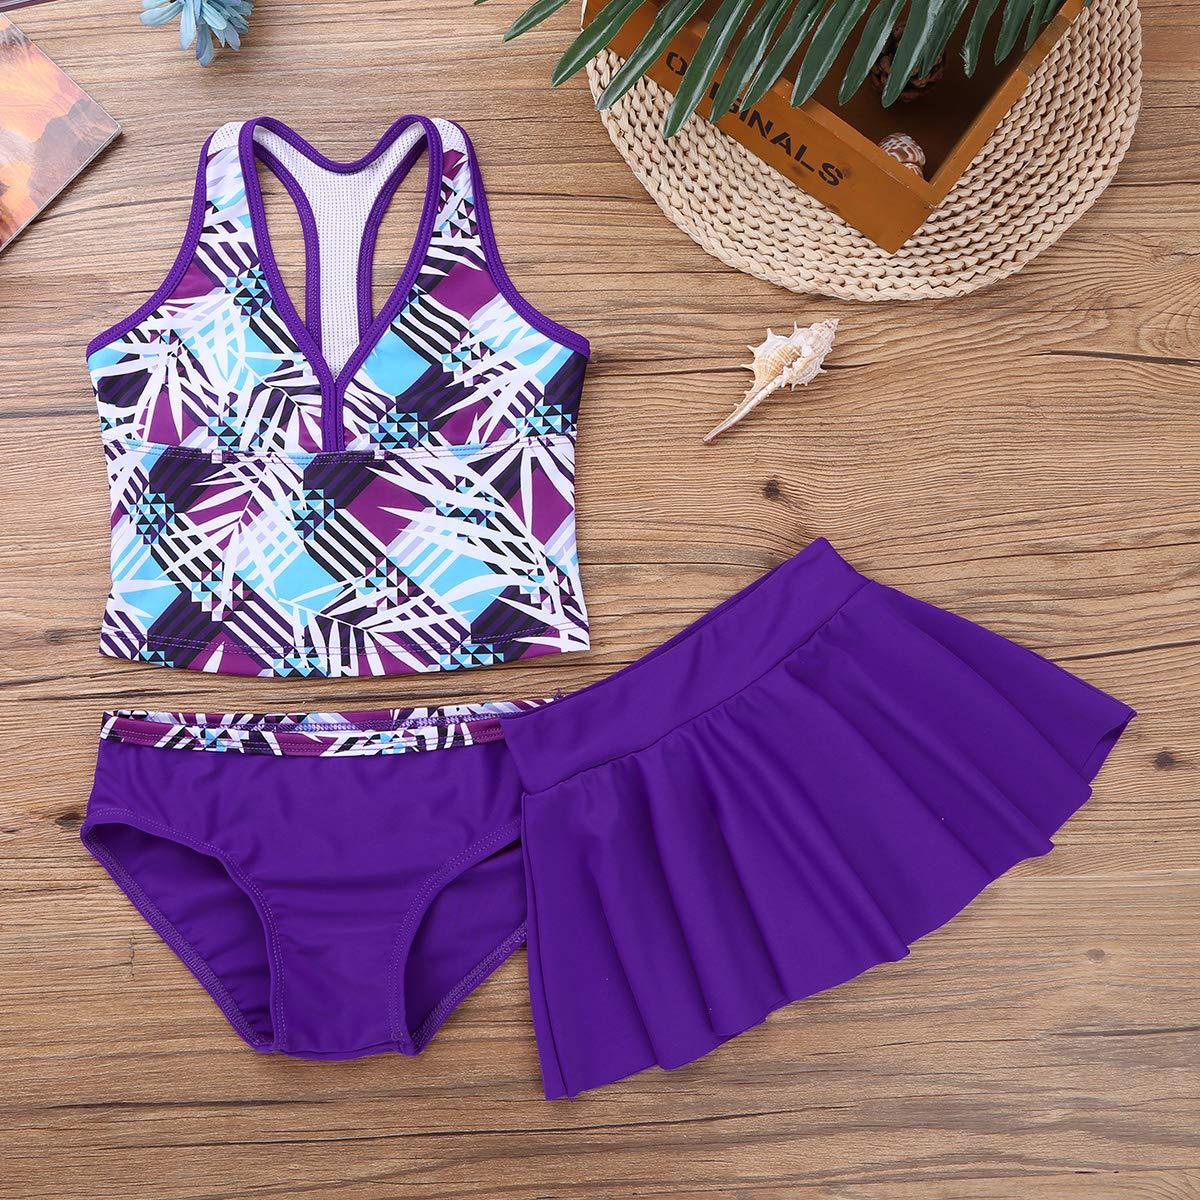 iEFiEL Big Girls Peace Signs Heart Print 2Pcs Tankini Swimwear Bathing Suit